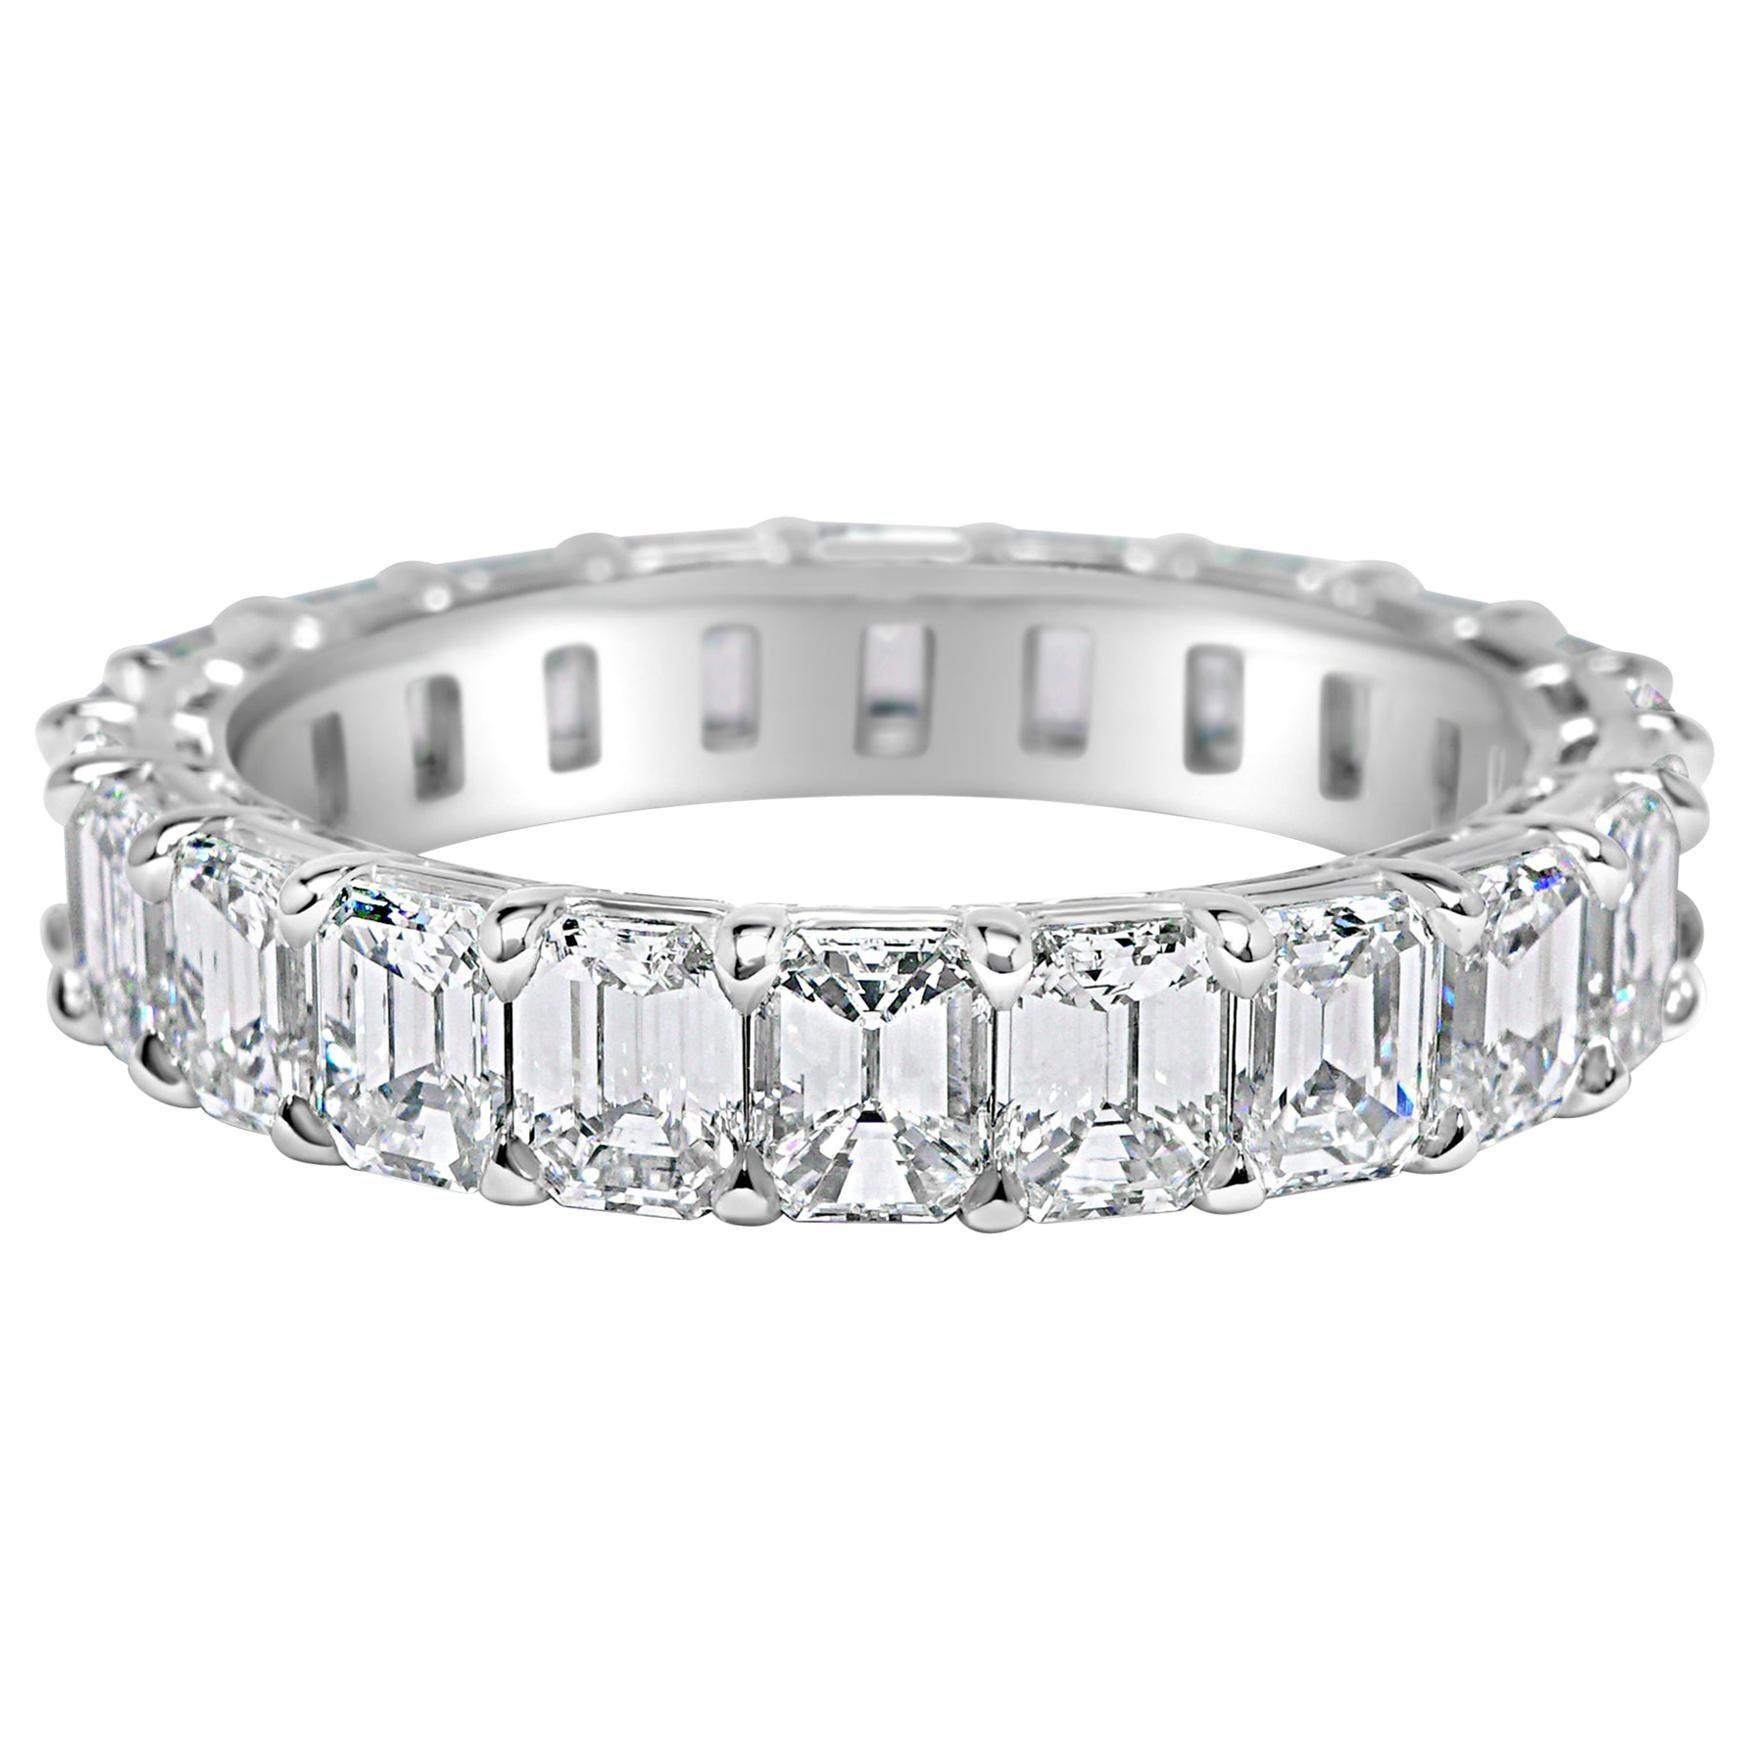 Emerald Cut 3.80 Carat Diamond Wedding Eternity Band Set in Platinum